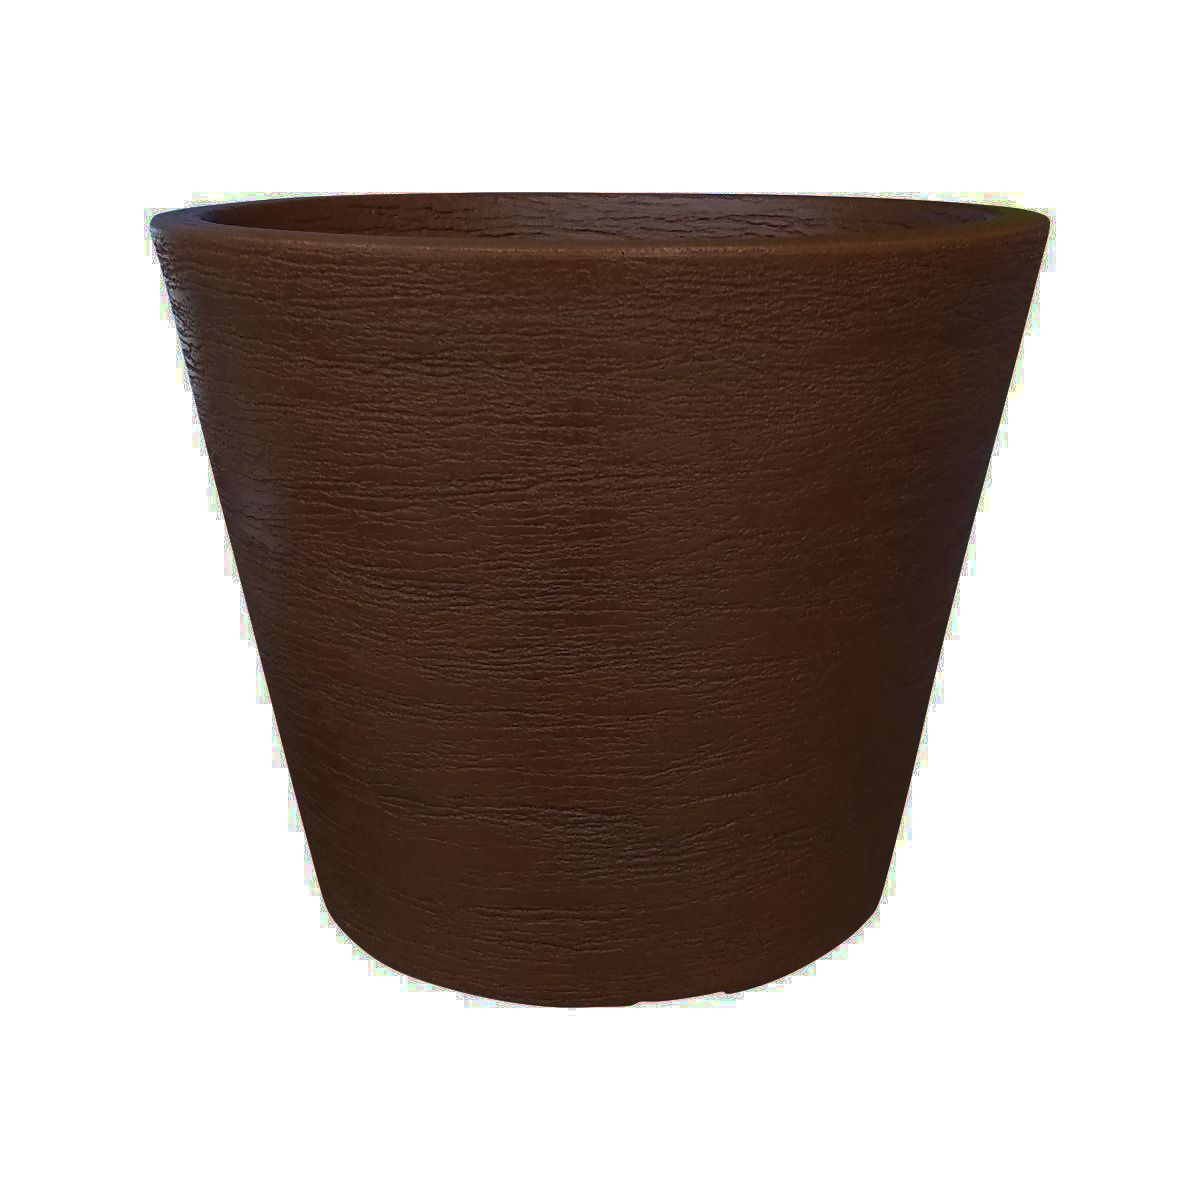 Vaso Cone Riscatto Vogue cor Ferrugem 31,5cm x 37,5cm - CBP1-FE